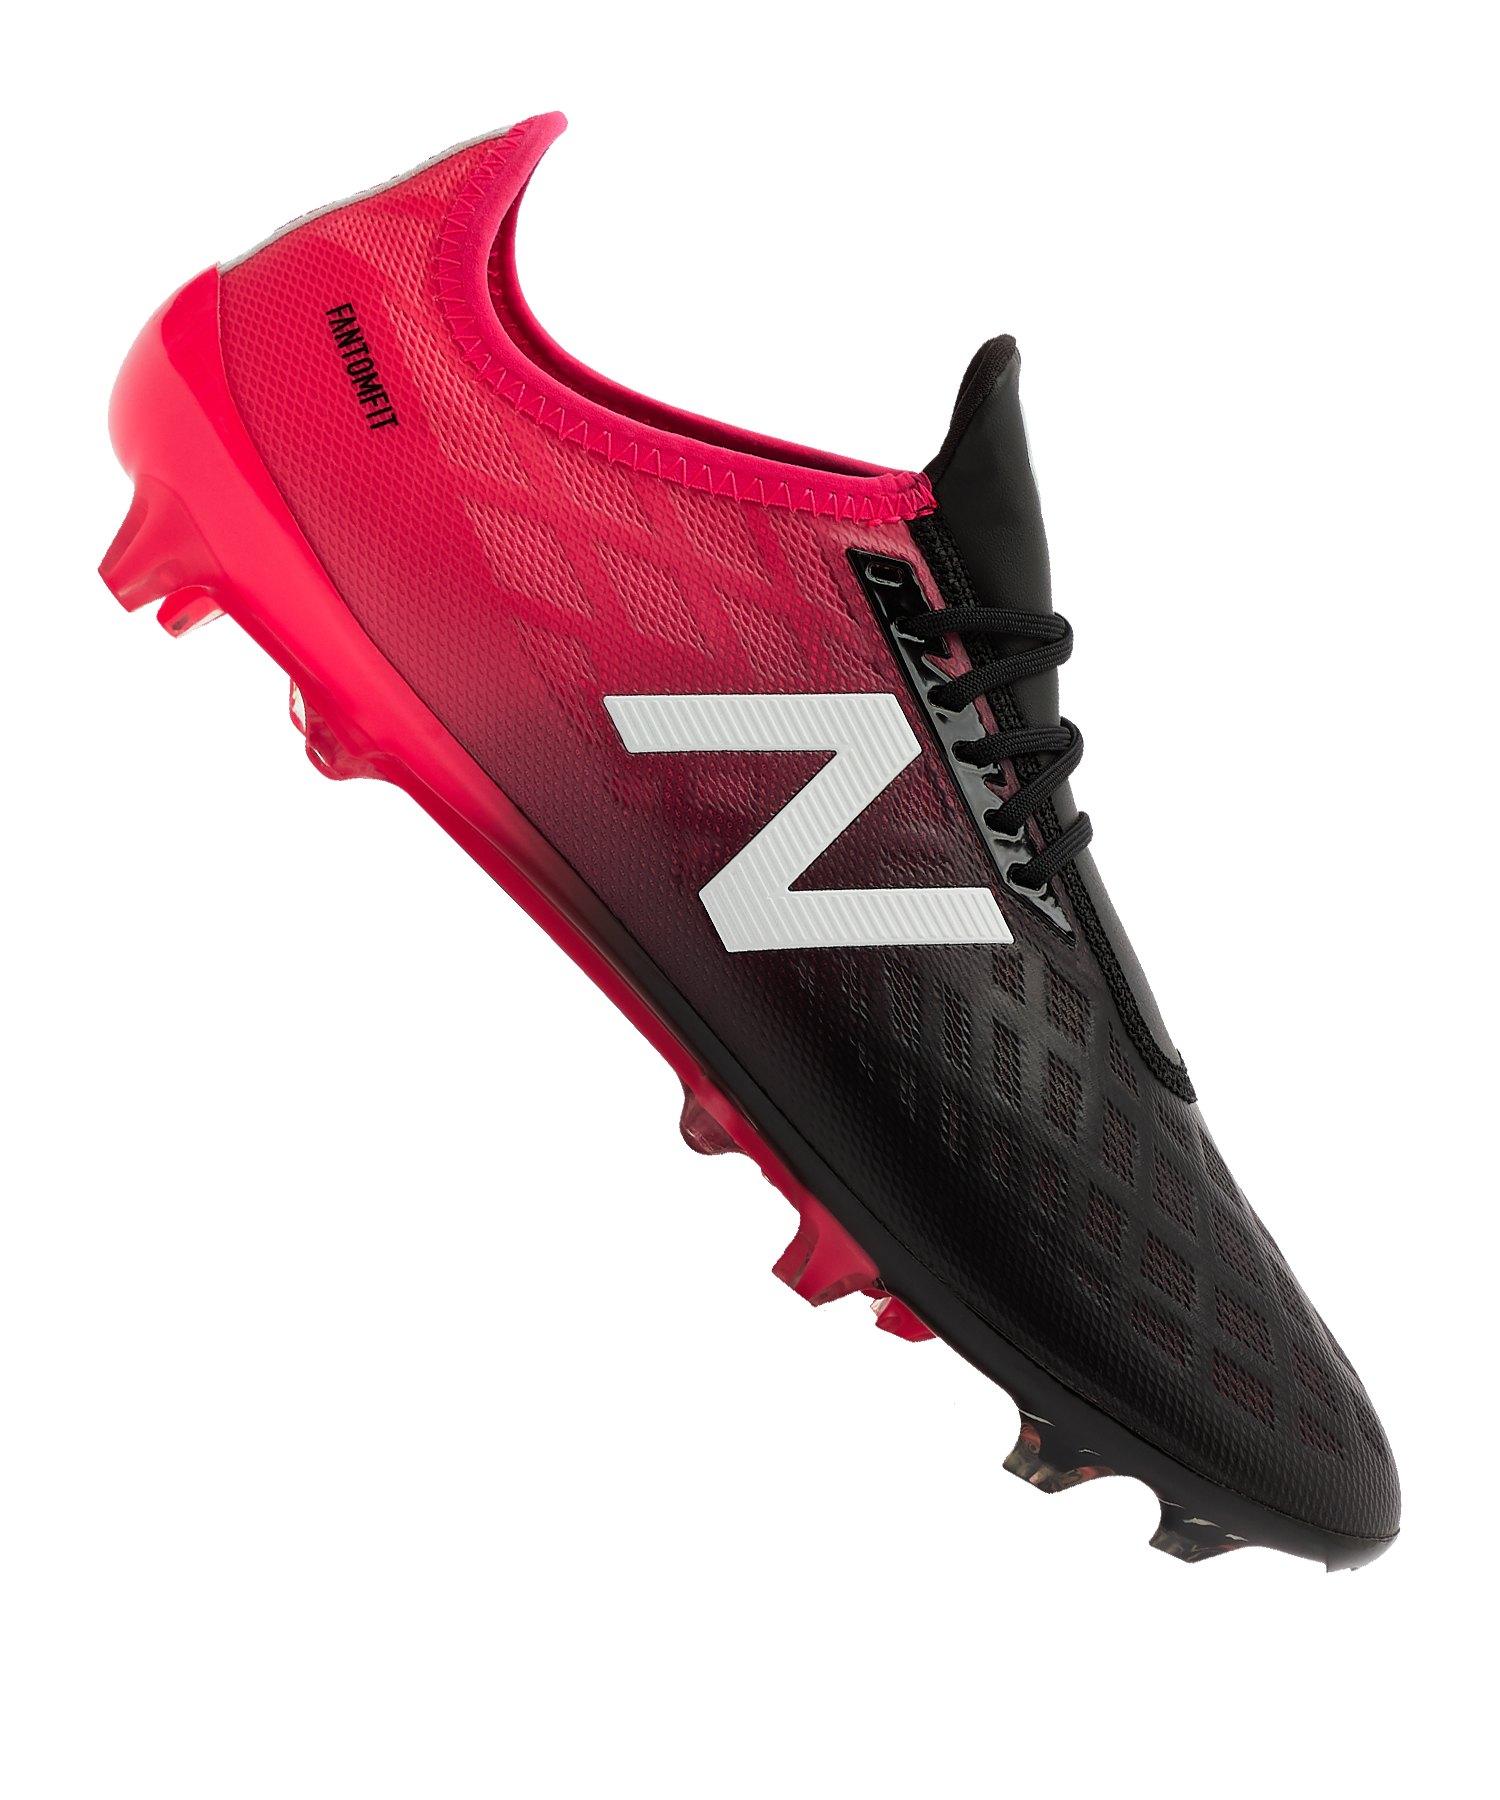 New Balance Furon Pro Fg Fußballschuh Nocken Herren Rot